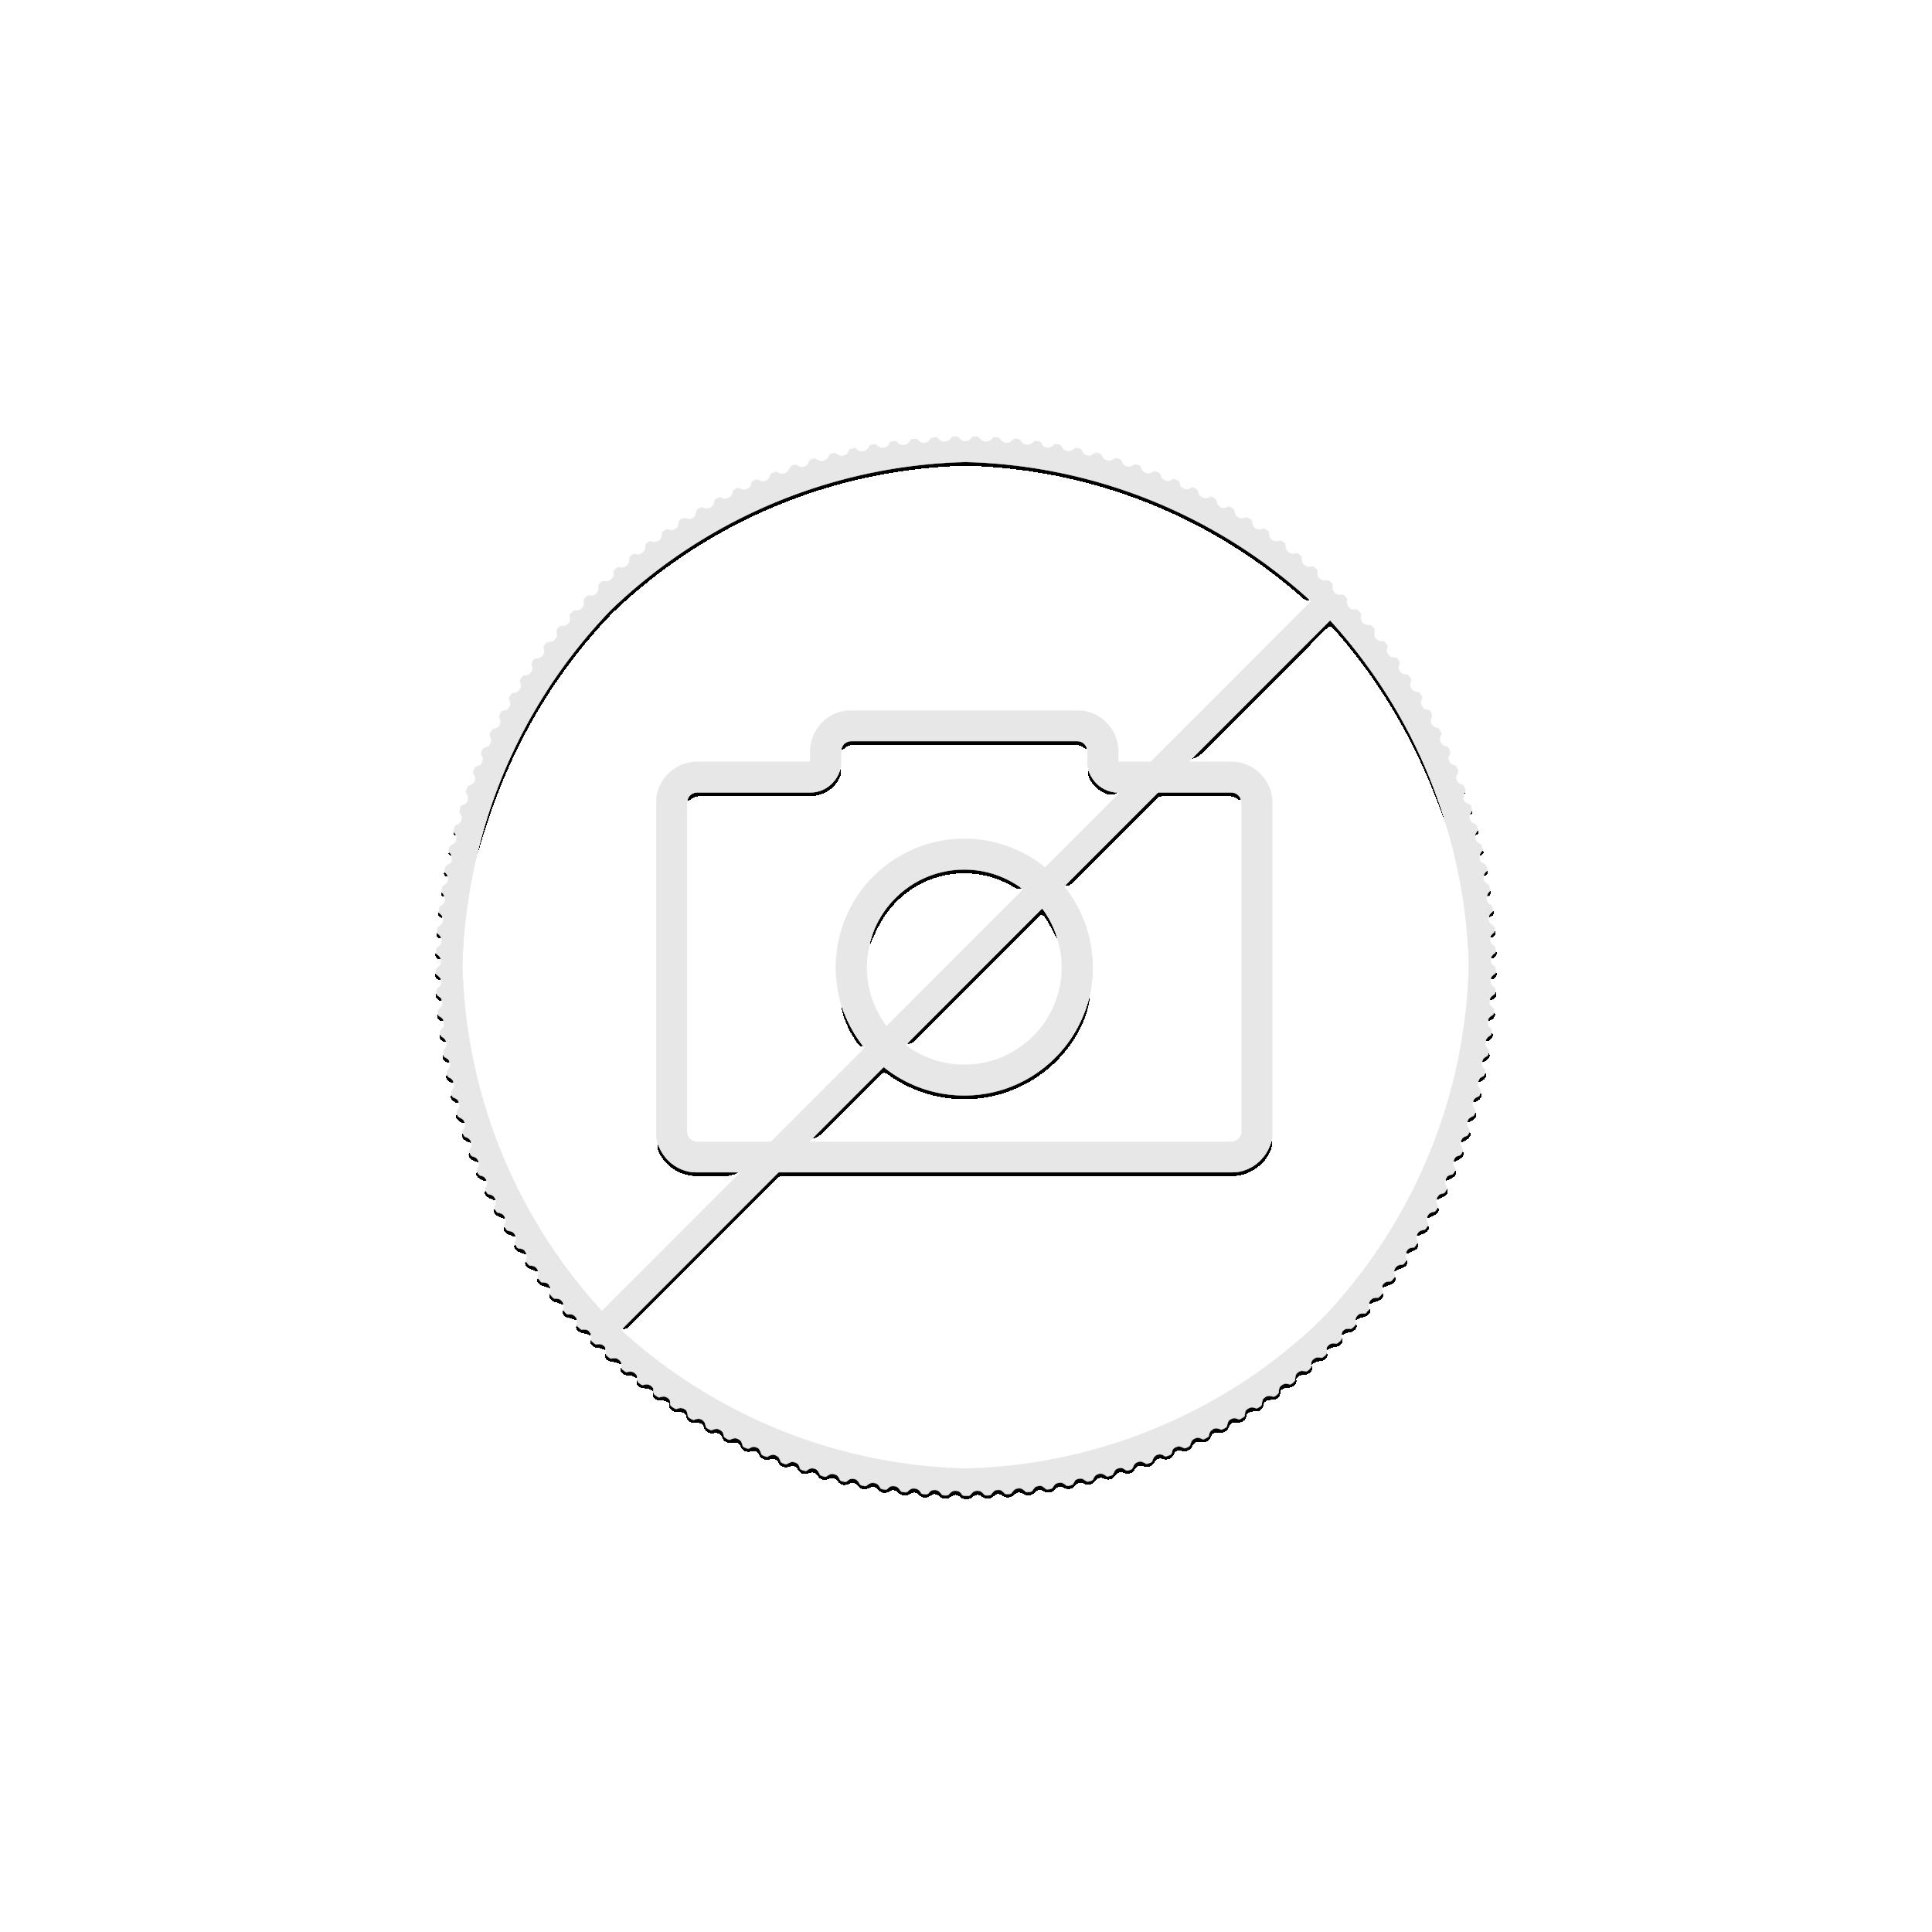 2 Troy ounce Ancient Calendars - The Kalachakra Mandala 2019